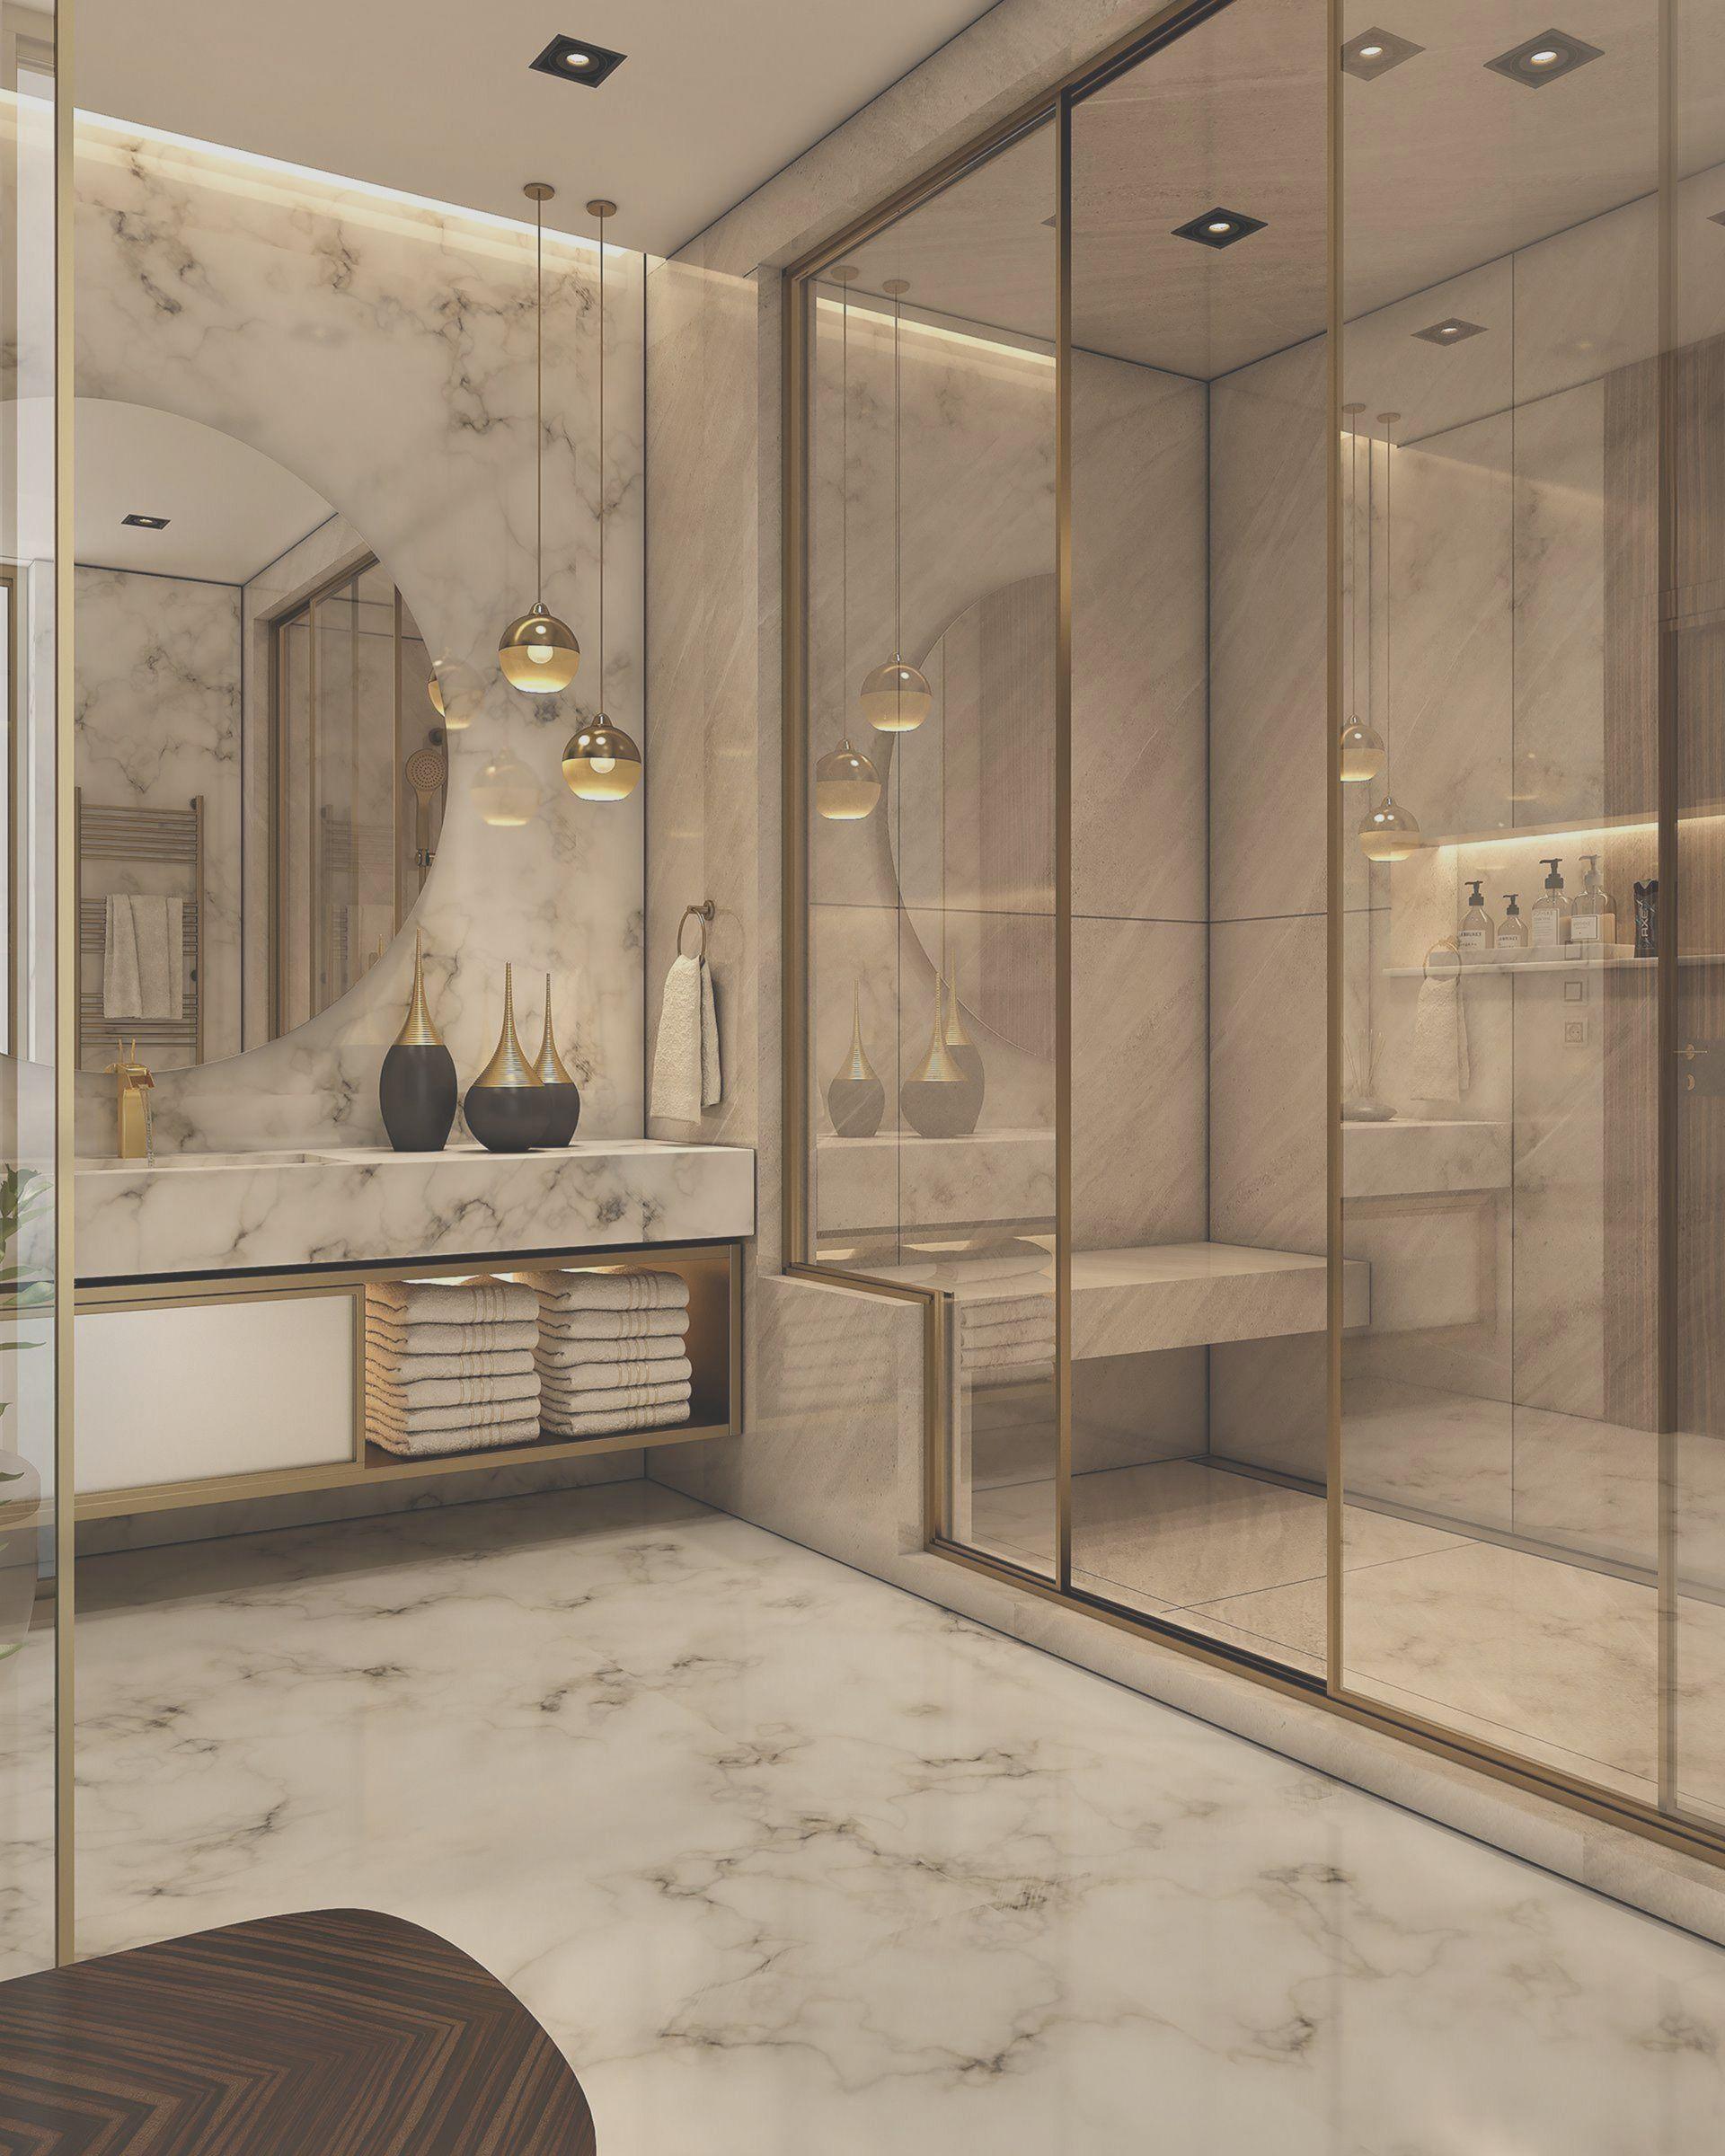 30 Enchanting Luxurious Bathroom Decor Design Ideas 2020 In 2020 Bathroom Design Luxury Bathroom Interior Design Modern Bathroom Design